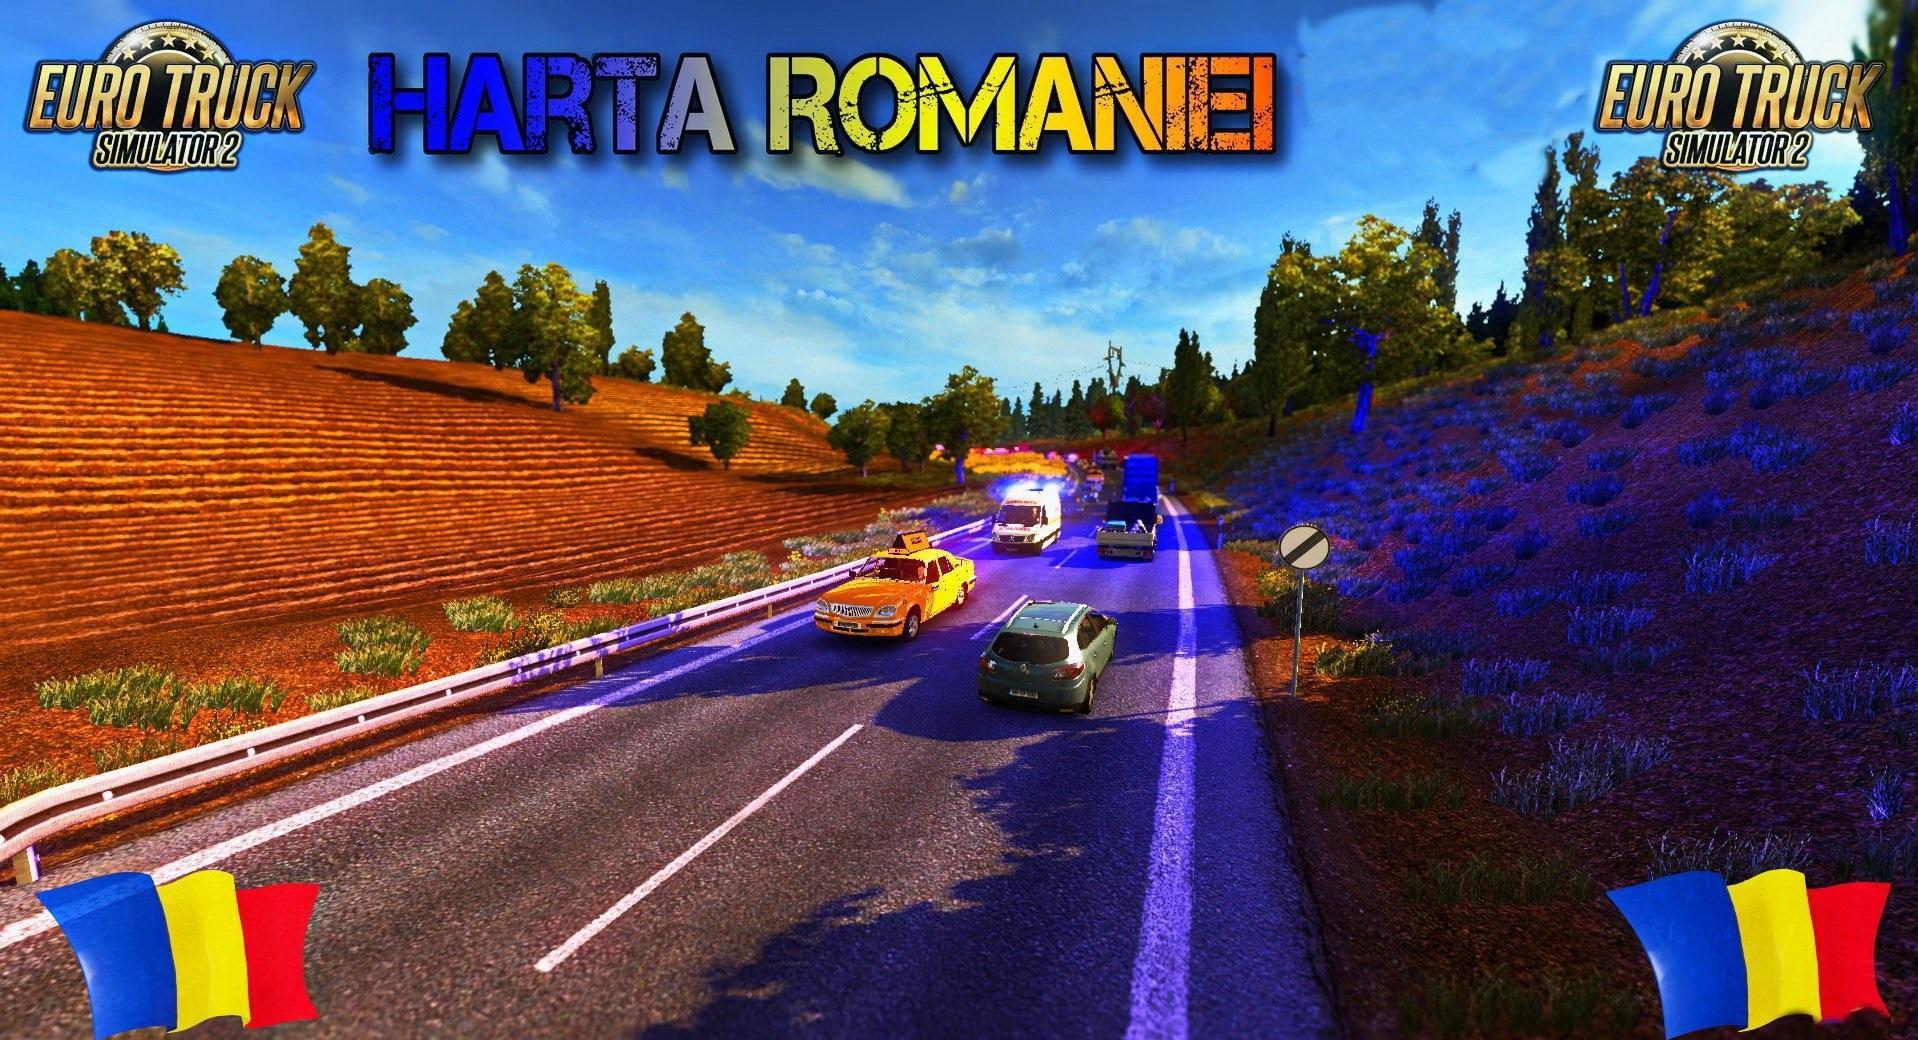 Euro truck simulator 2 romania map hd 2 youtube.